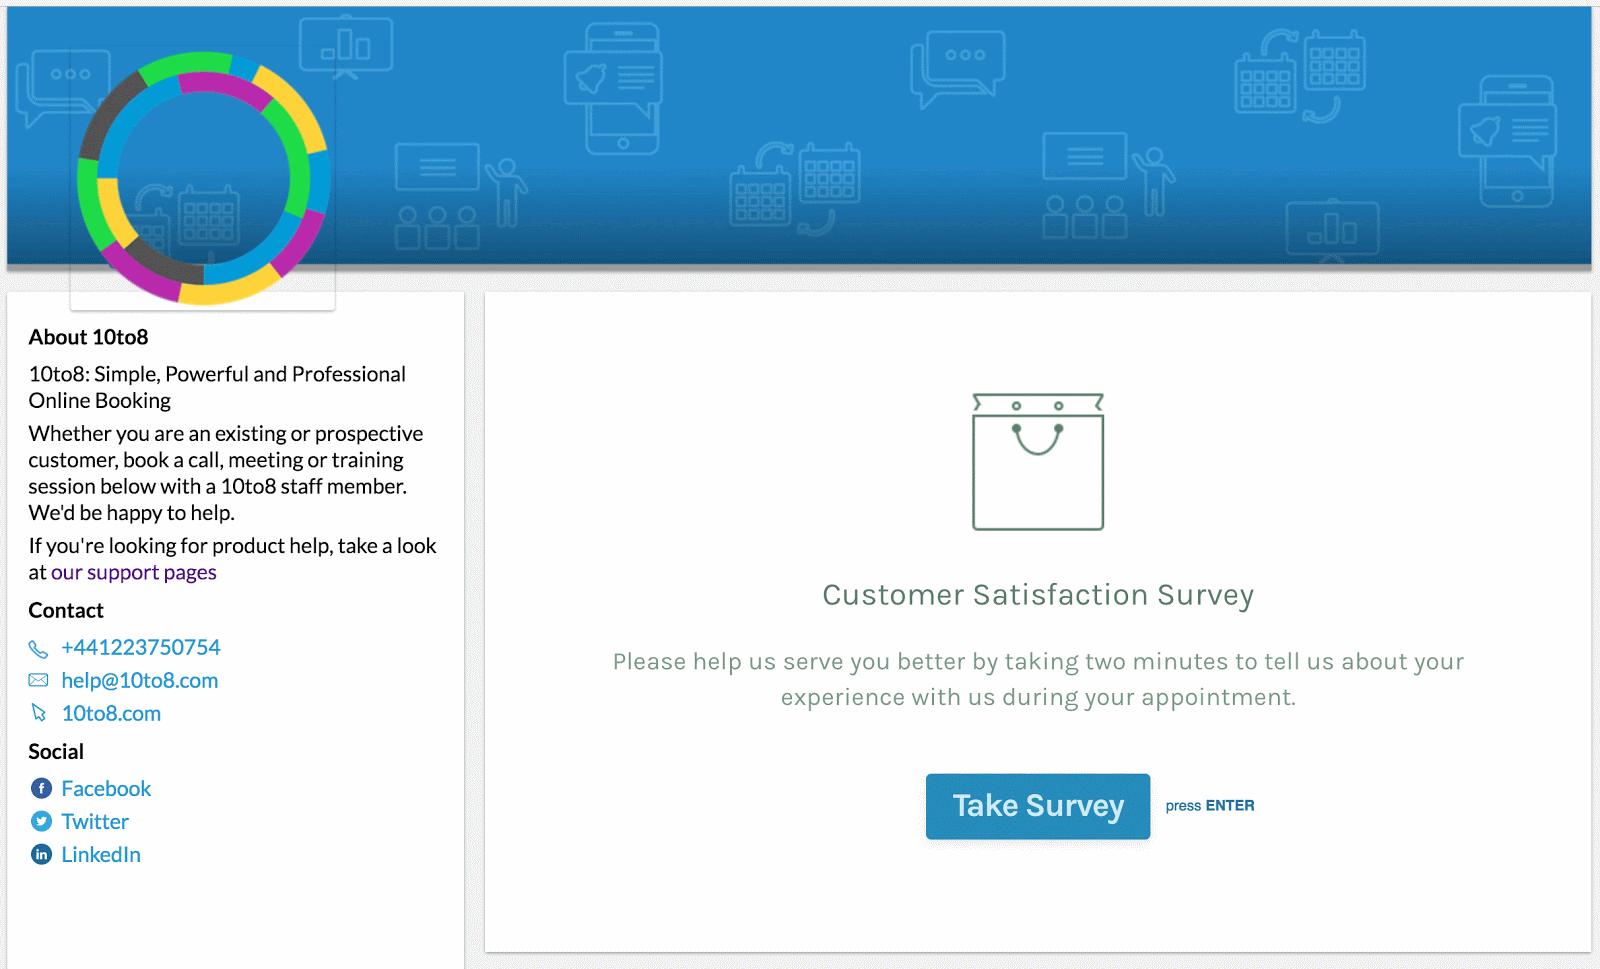 What the client sees - Survey